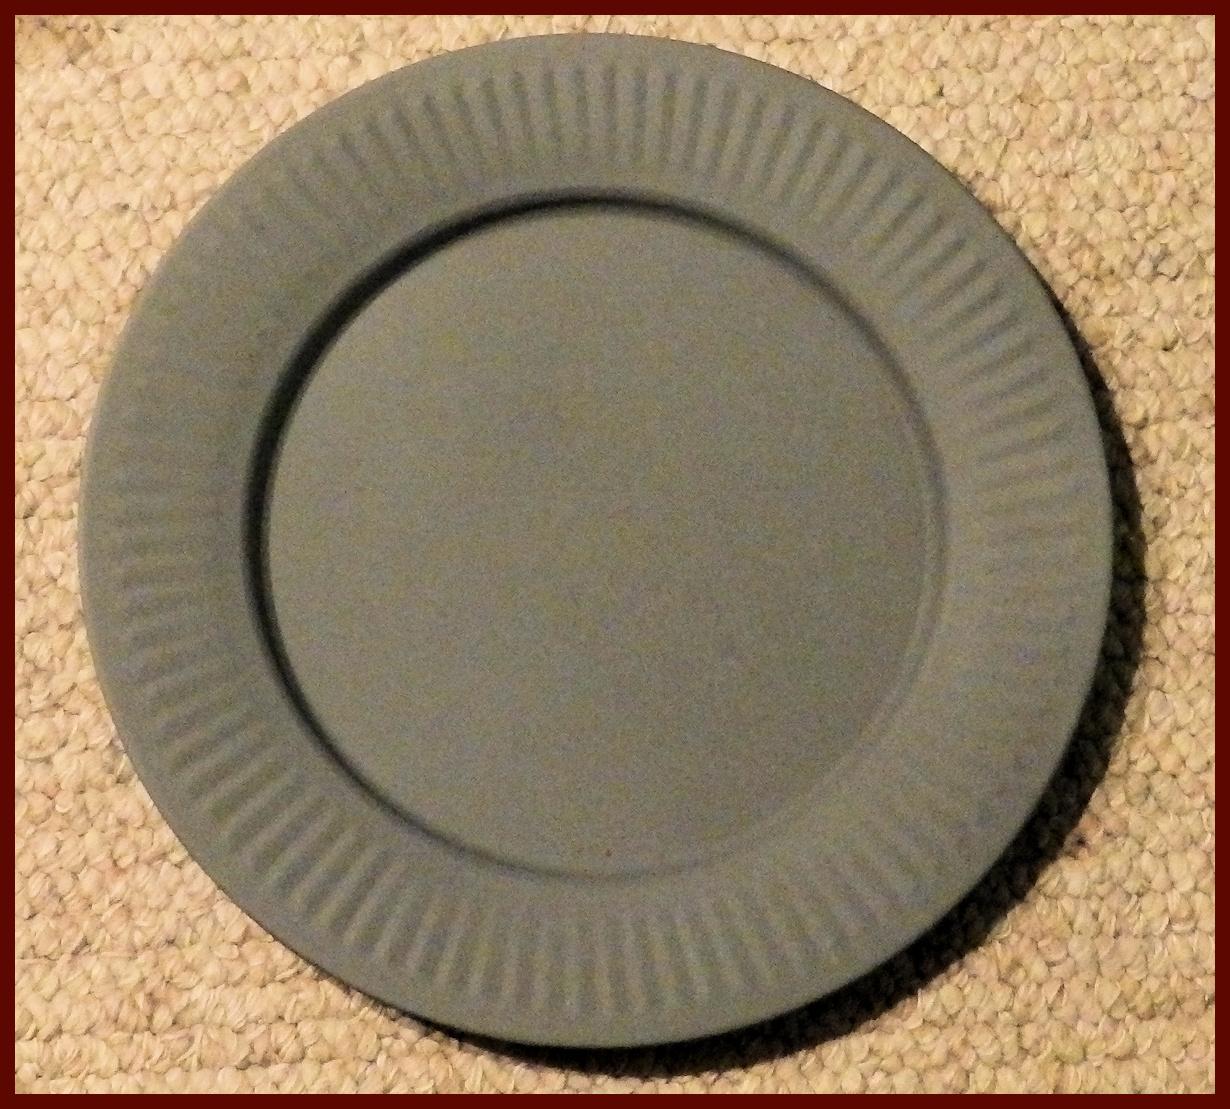 plate-13-inch-round-tin-plate-hx83098.jpg